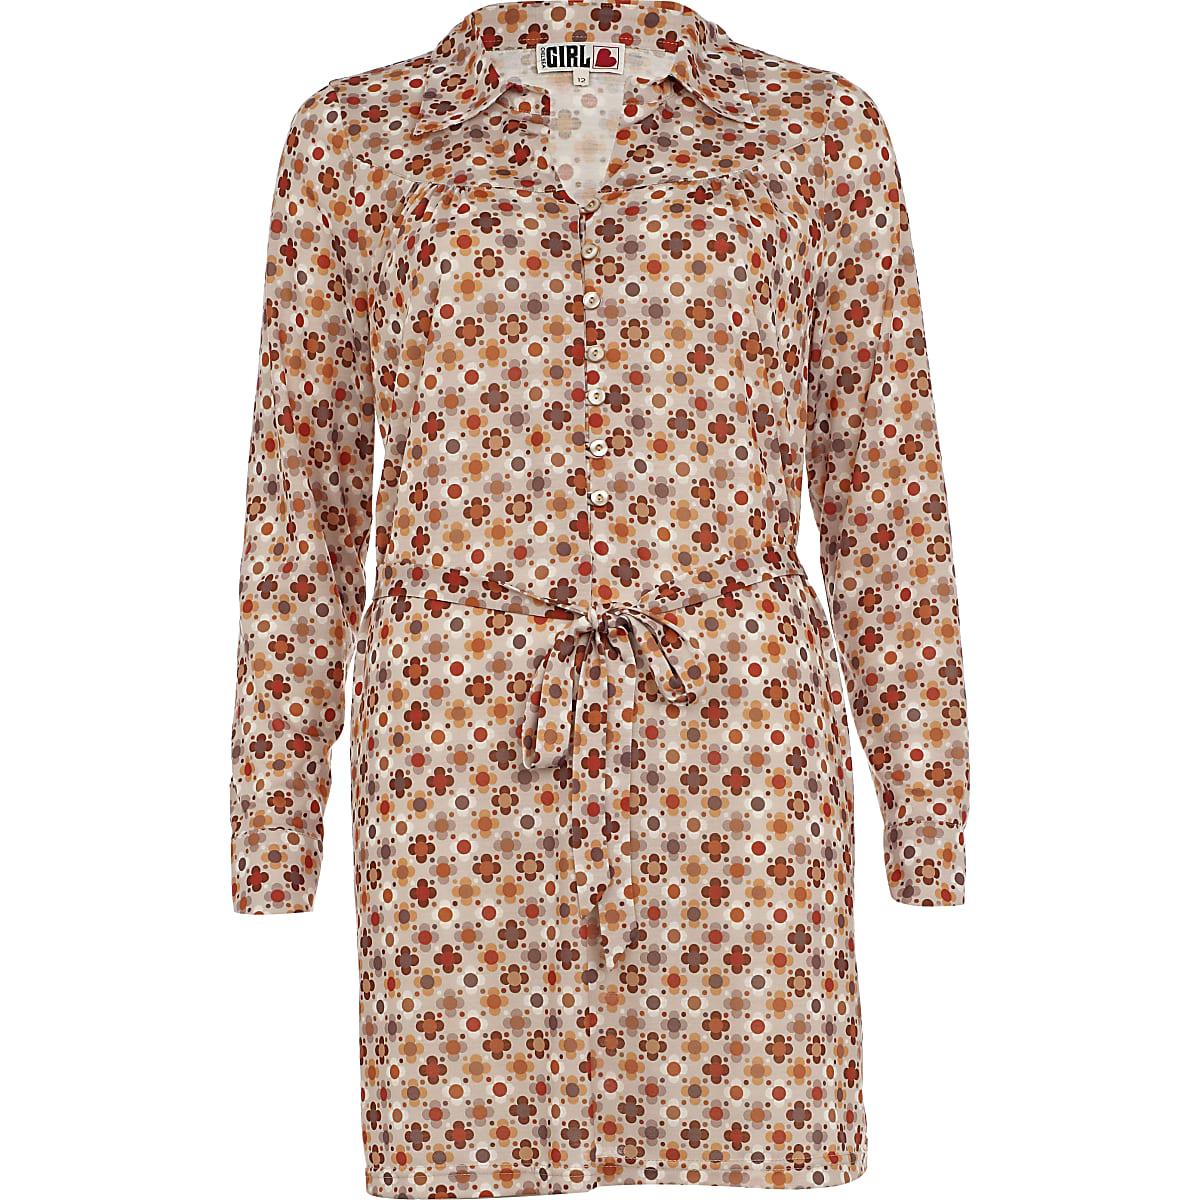 Beige print chelsea girl shirt dress